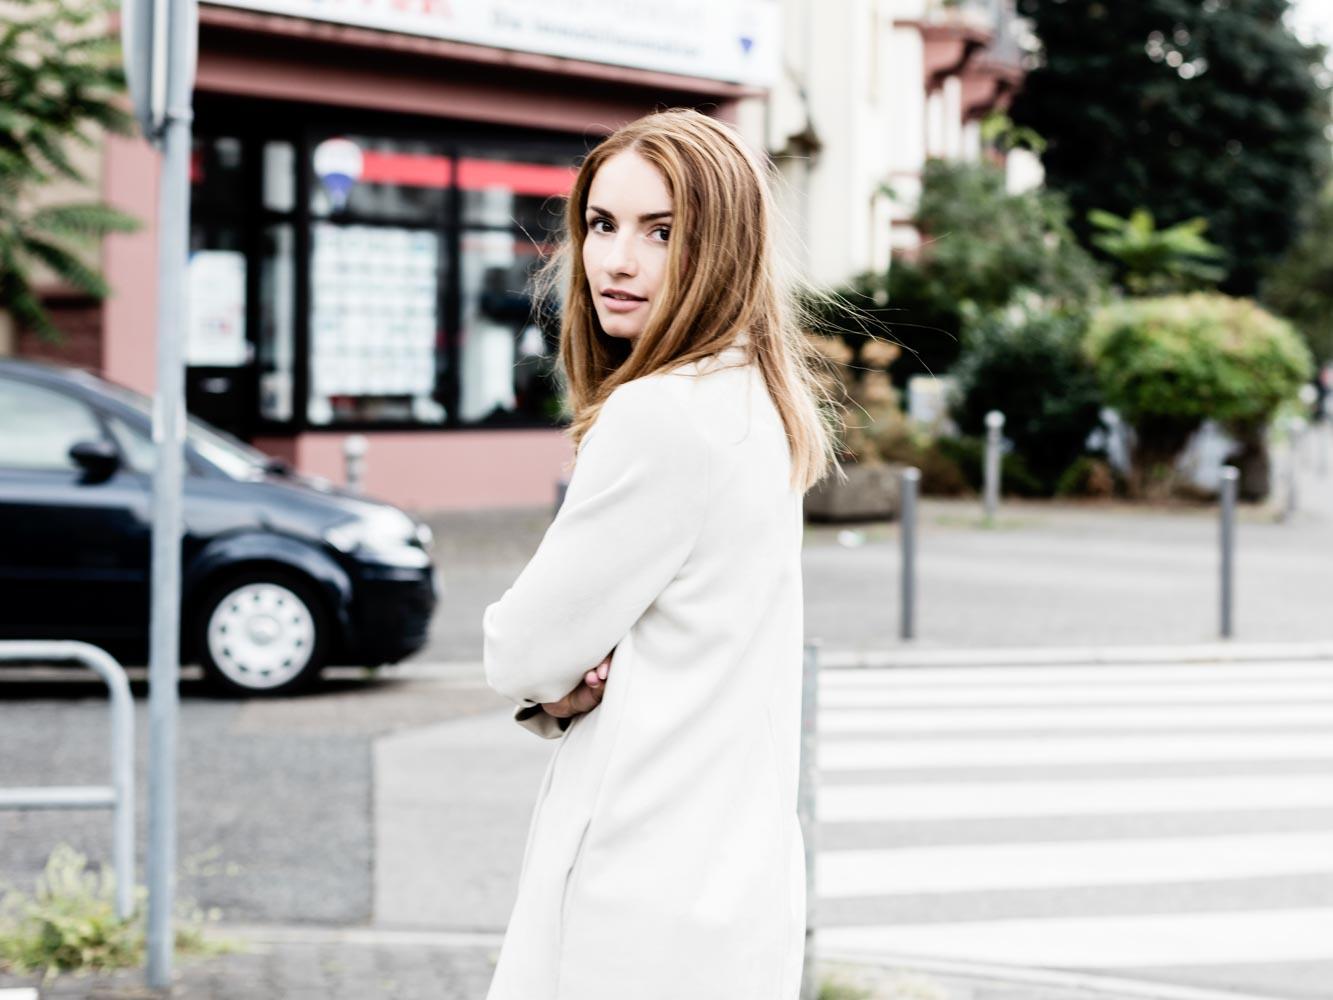 story_daniel_kummer-caroline_kalthoff_2018-06